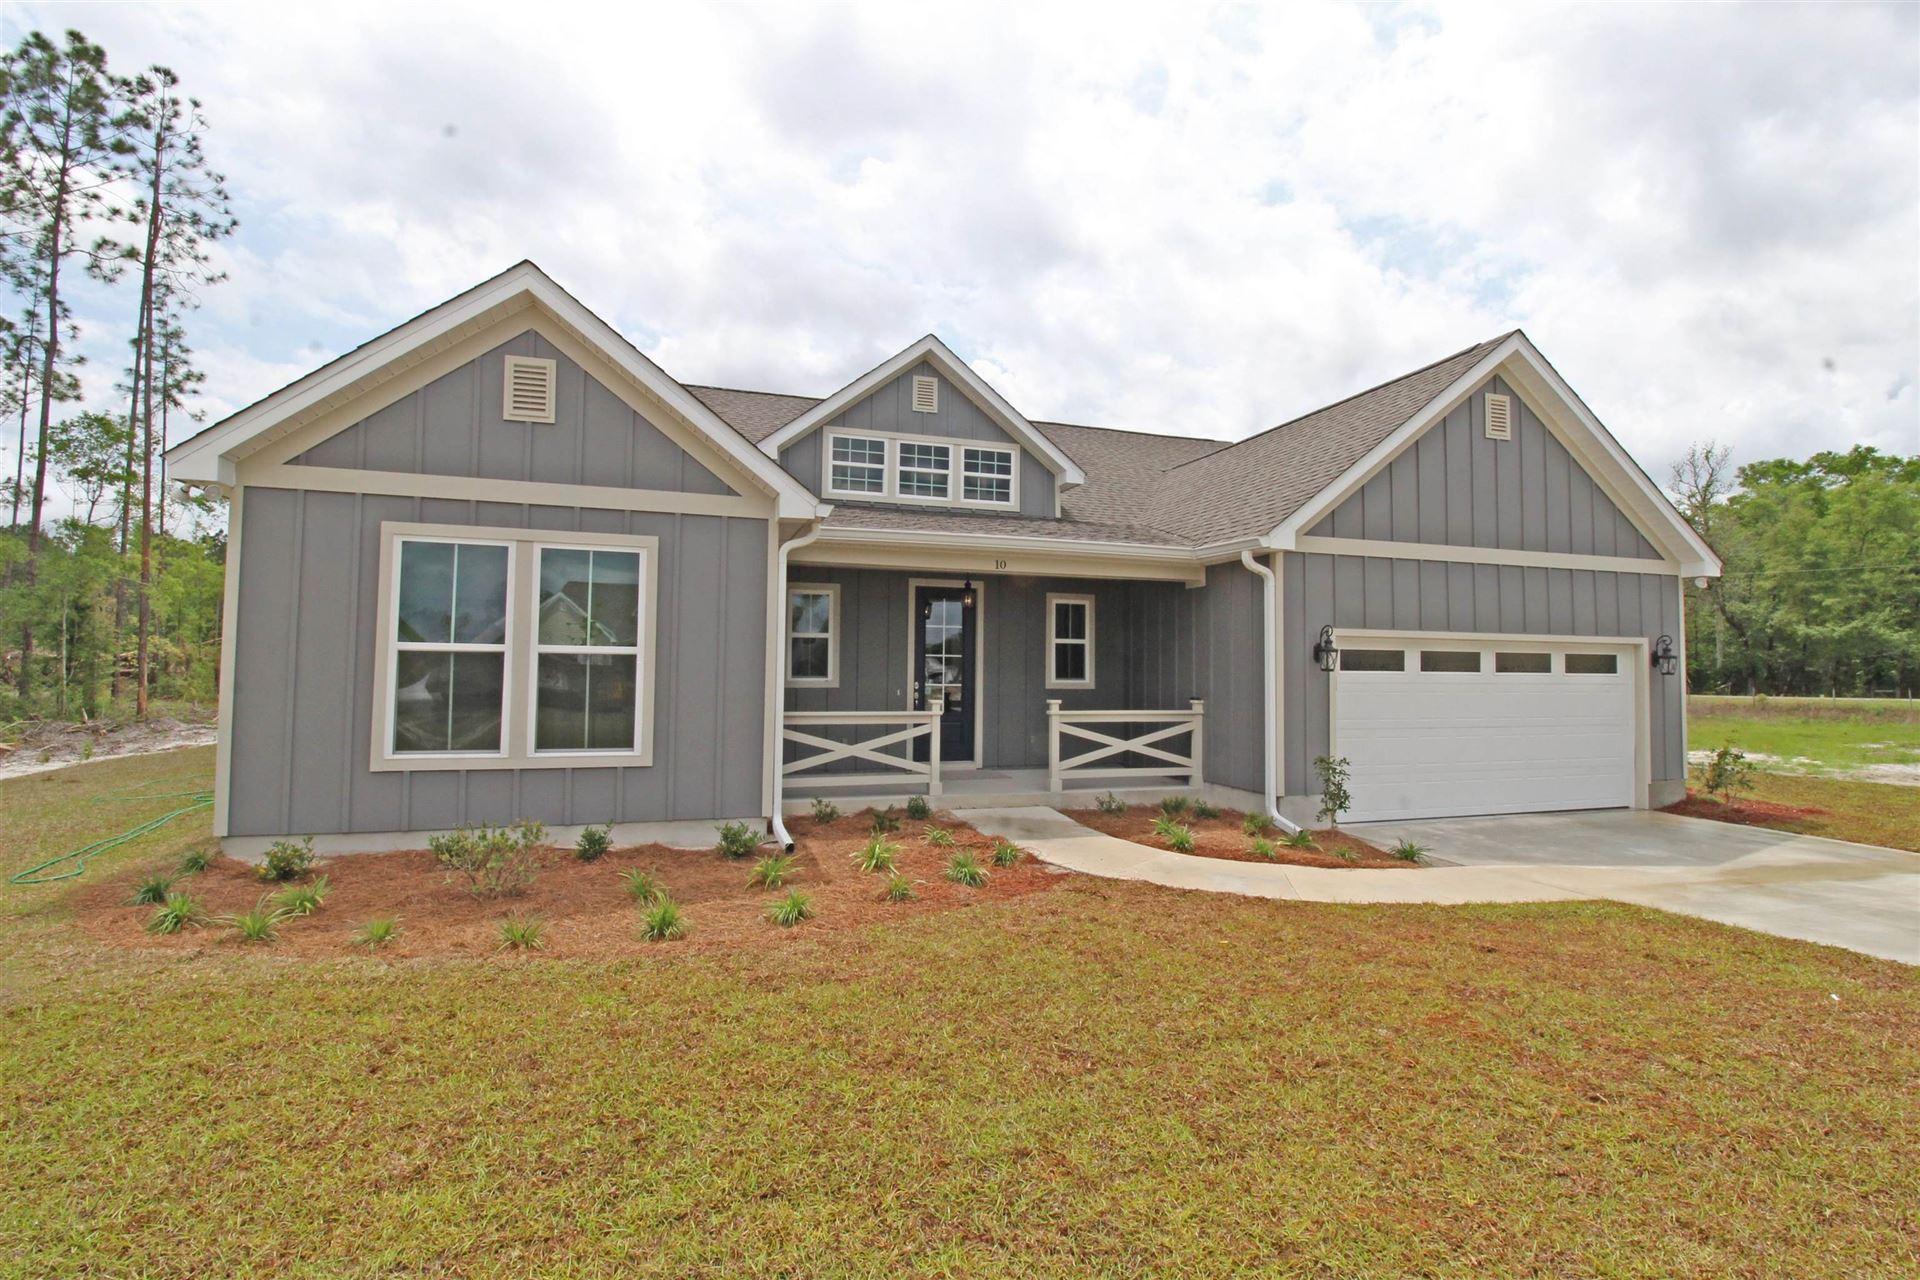 10 Kensington Court, Crawfordville, FL 32327 - MLS#: 336286